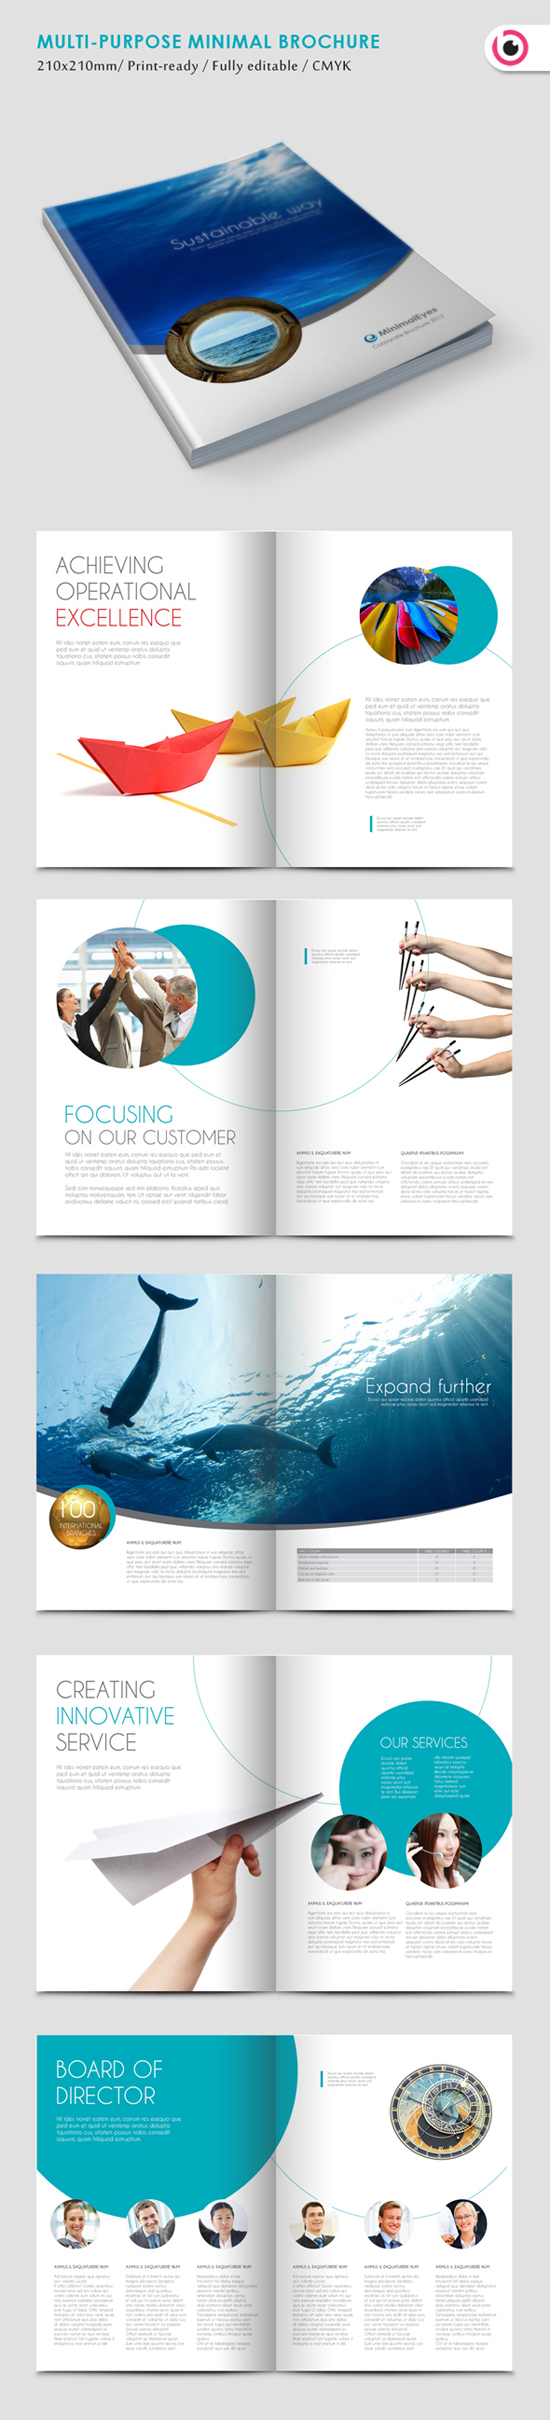 Multi-Purpose Minimal Brochure Template